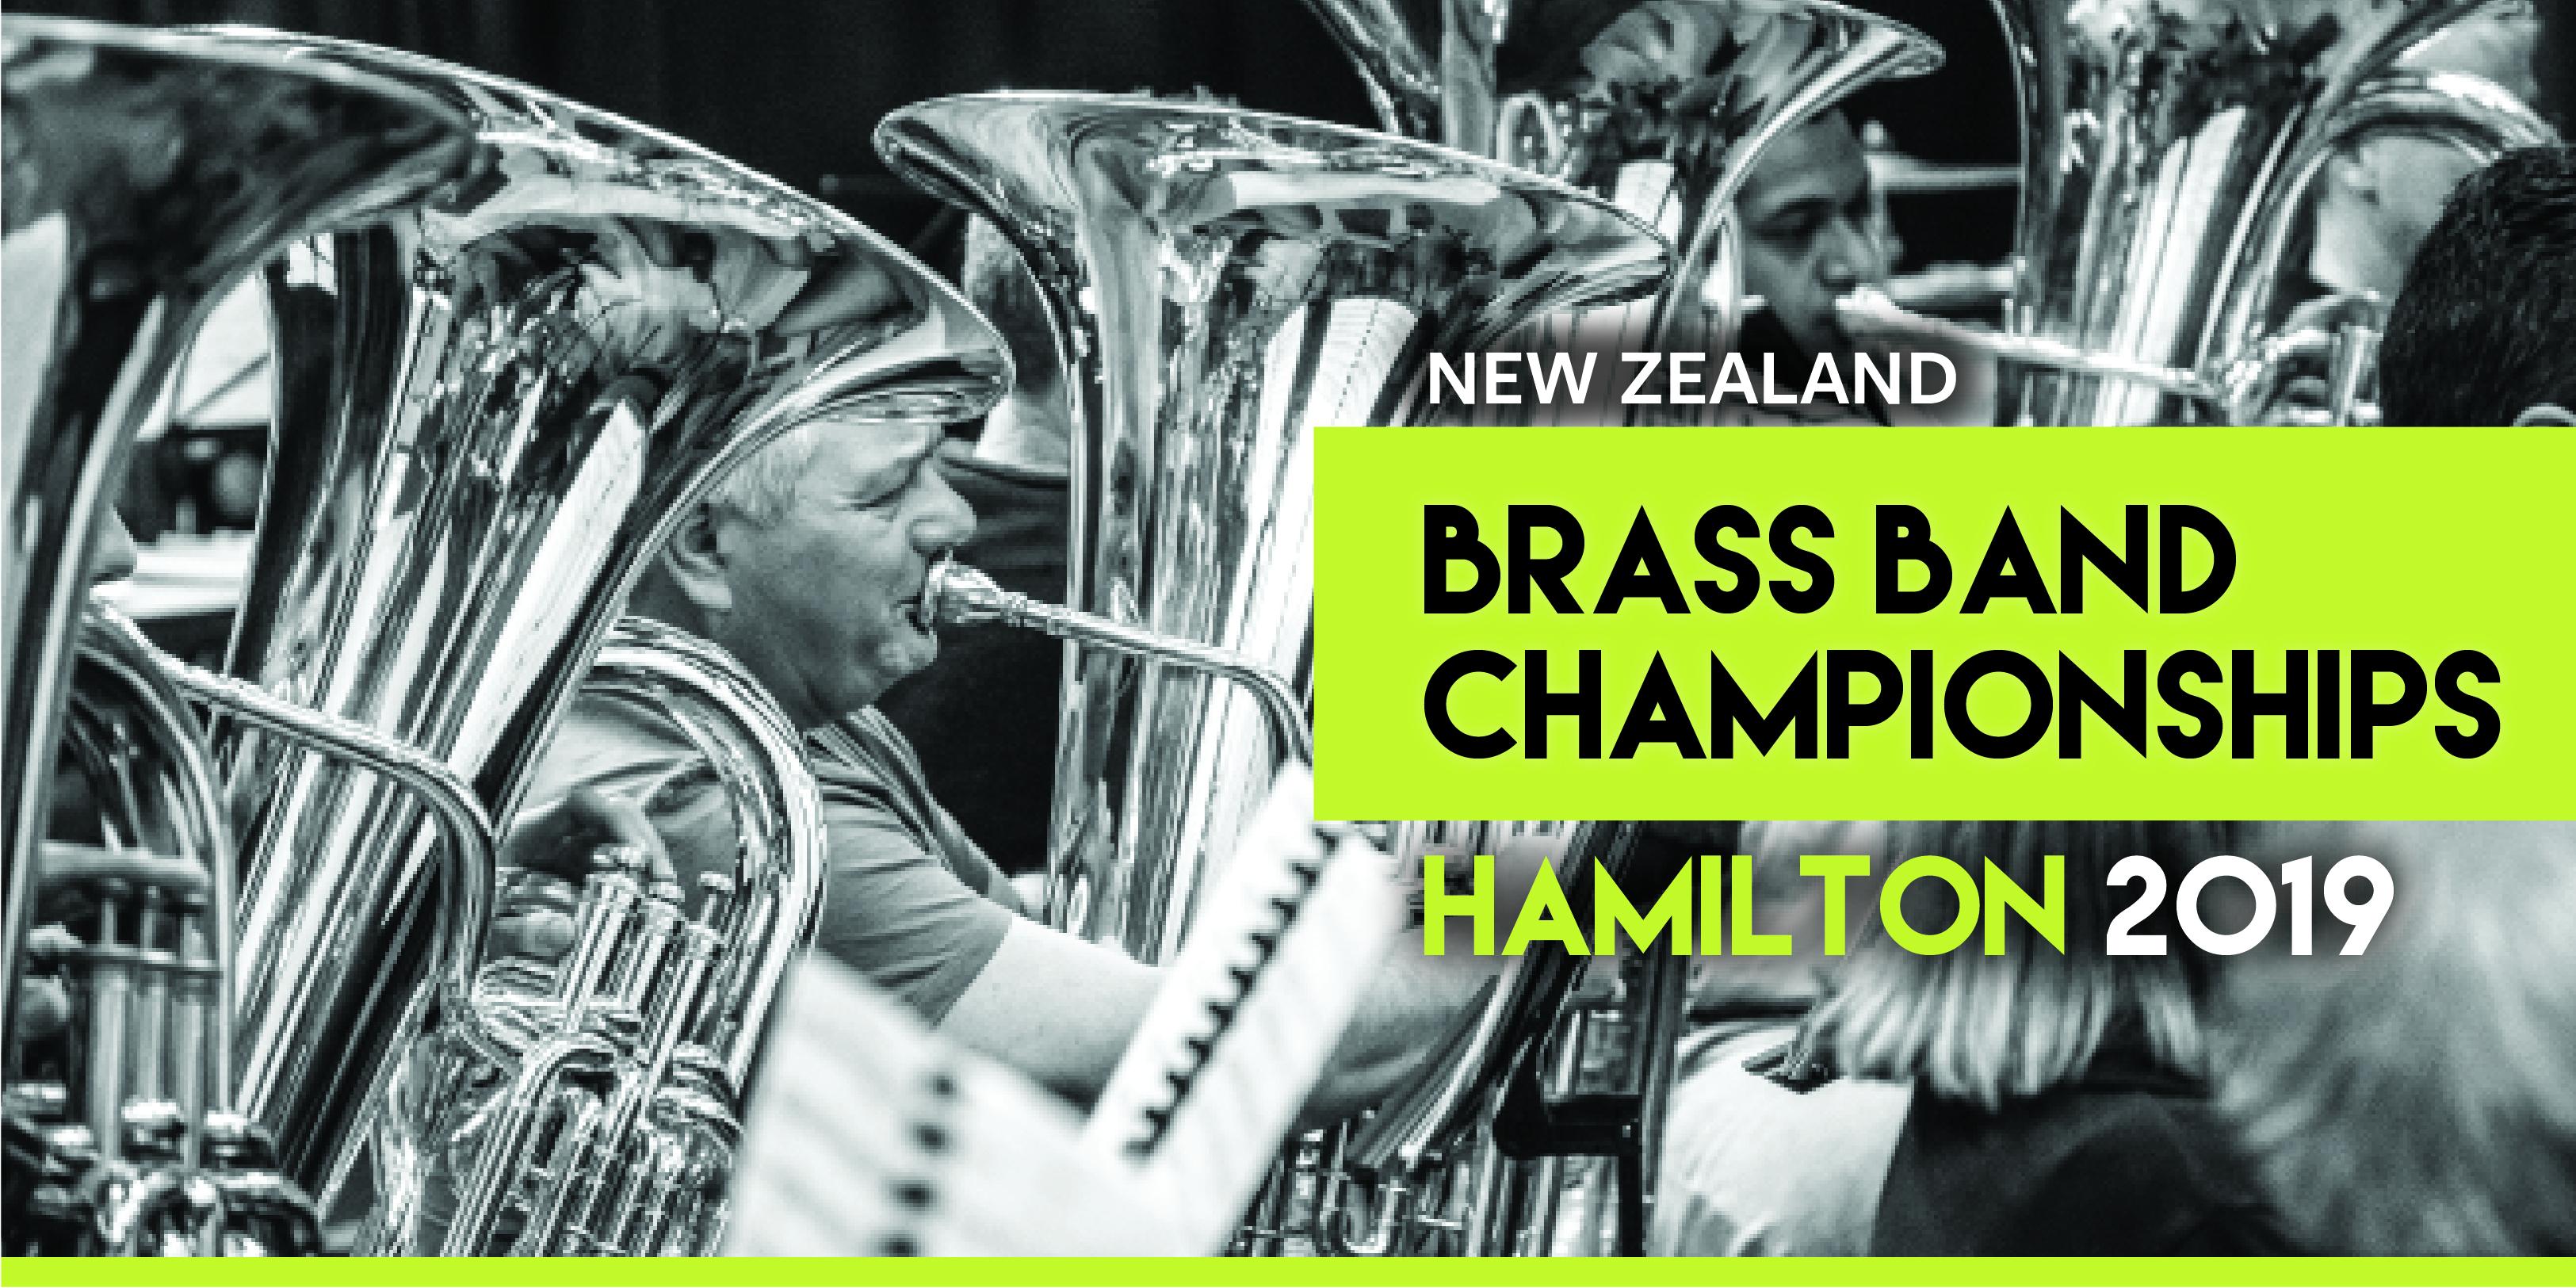 NZ Brass Band Championship 2019 - Claudelands